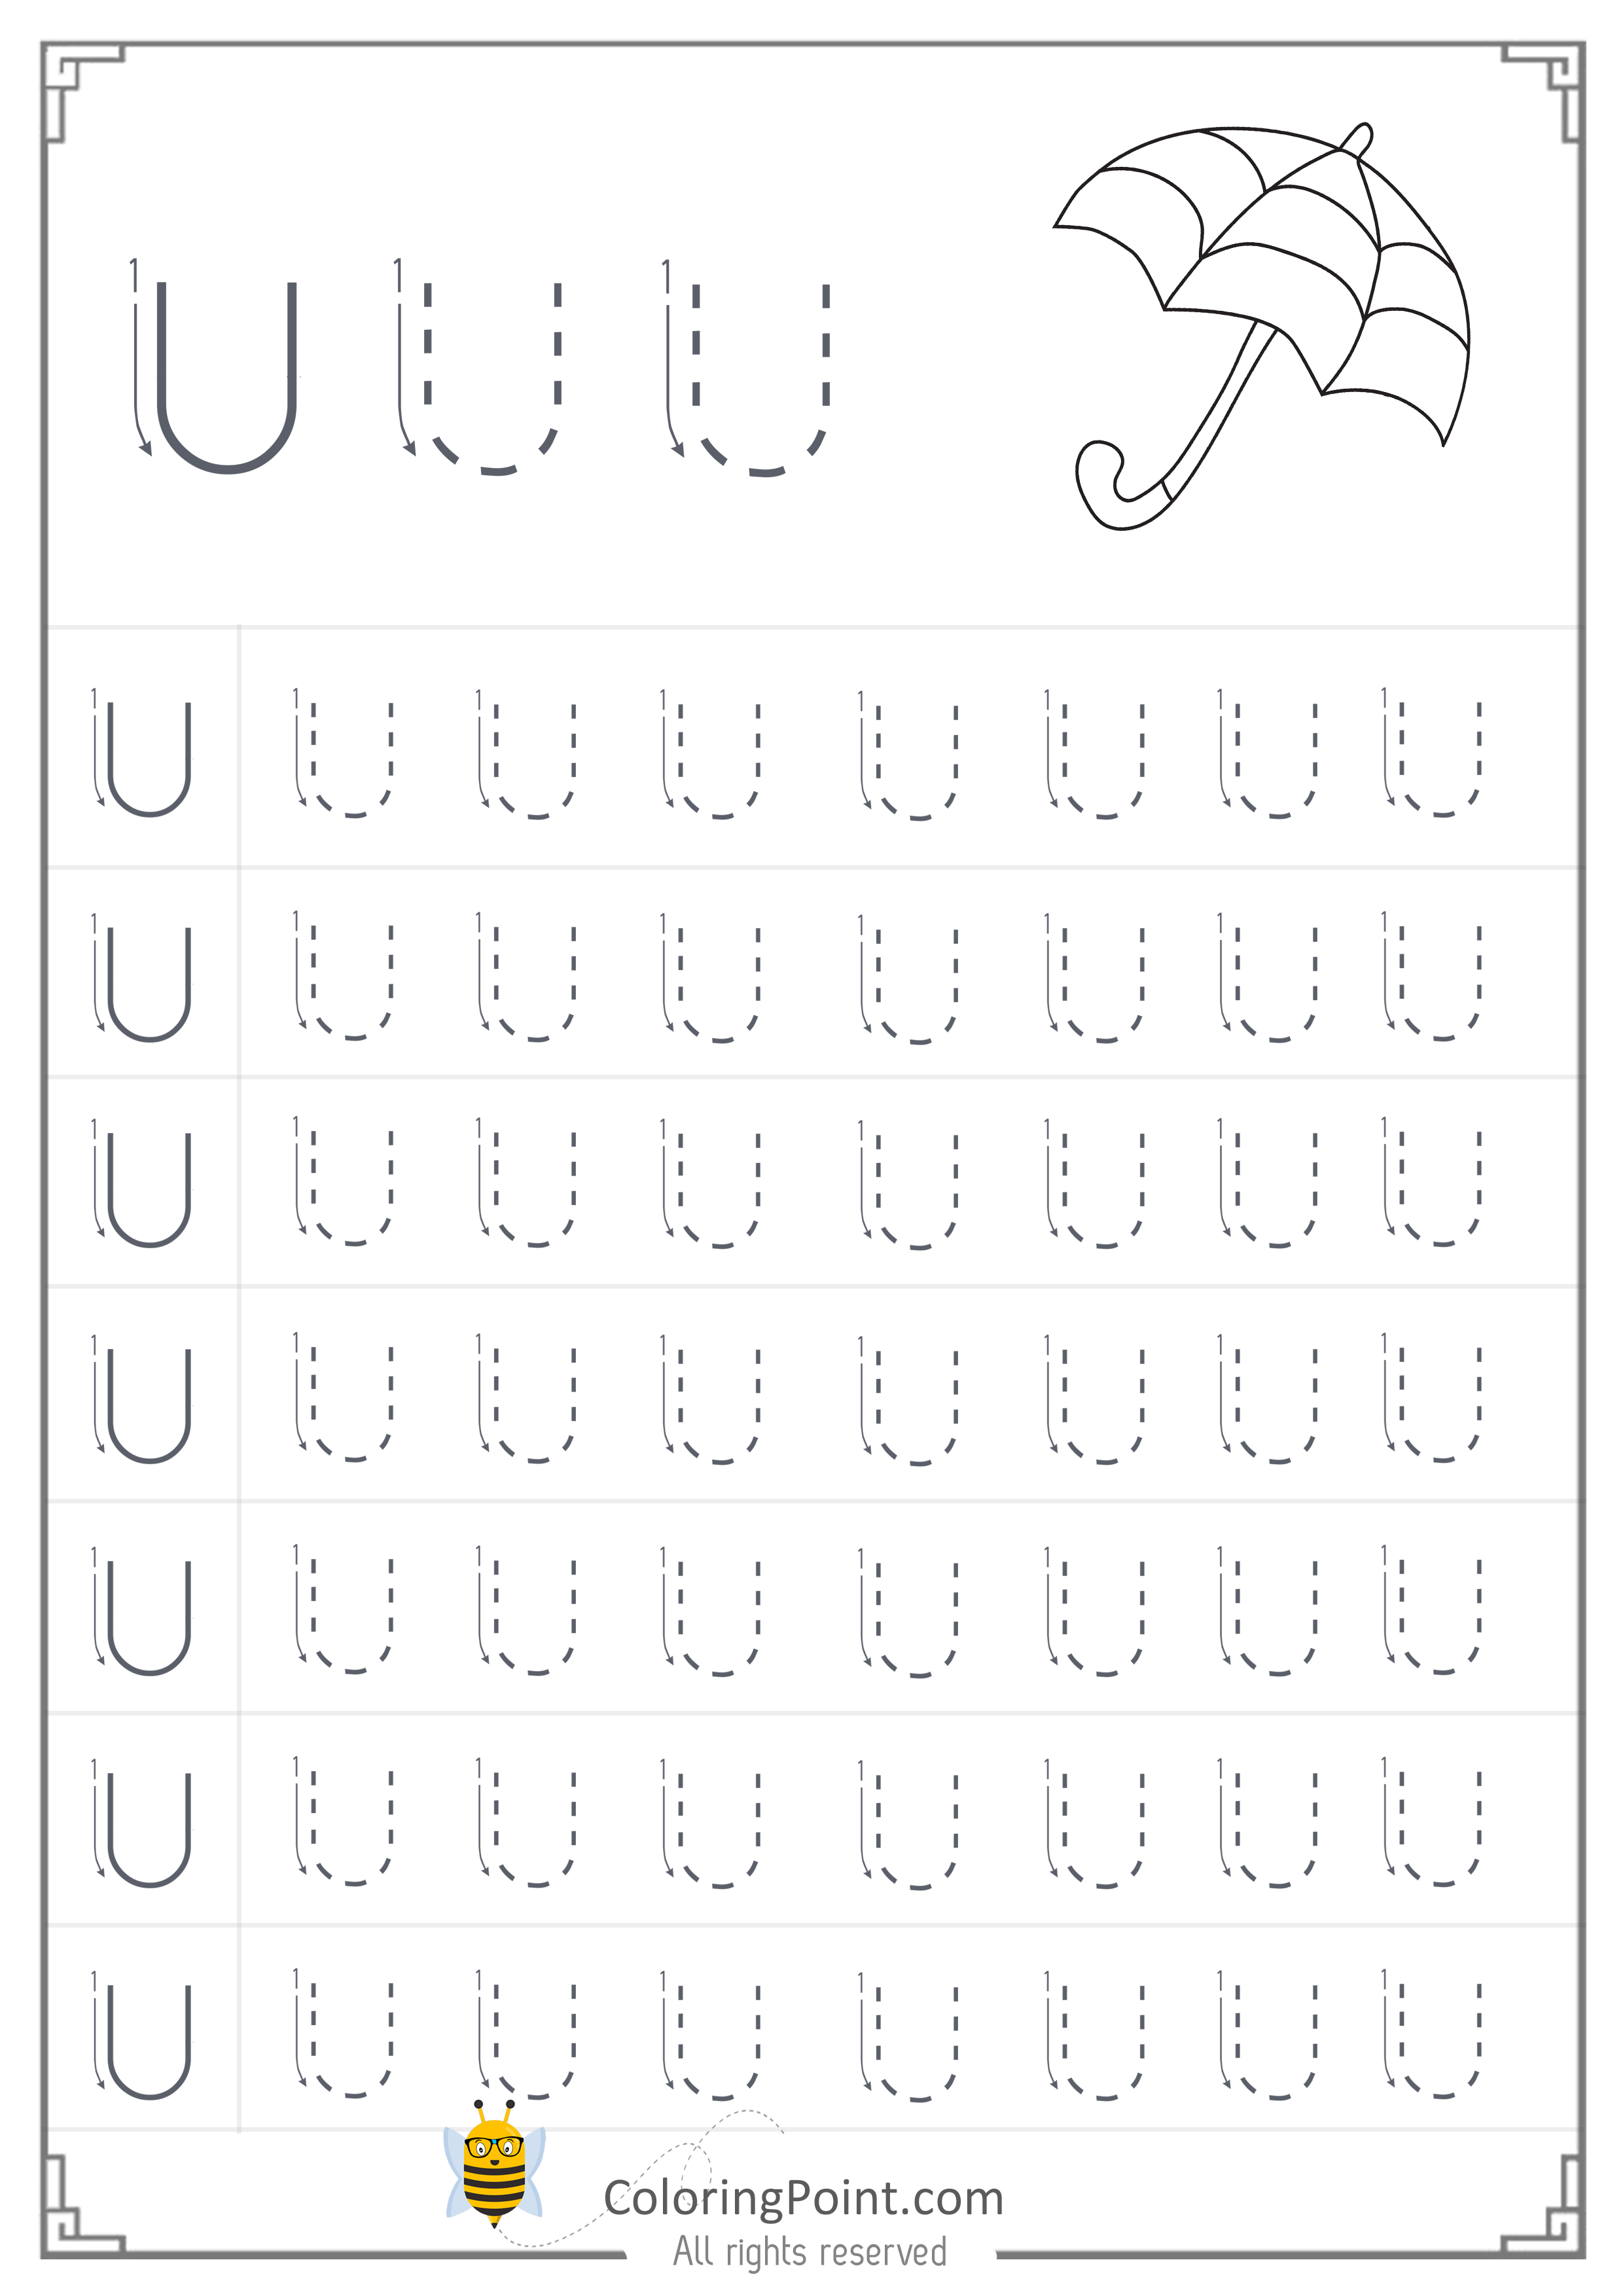 Free Printable Tracing Letter U Worksheets Preschool Coloring Point Coloring Point Tracing Letters Math Fact Worksheets Letter Tracing Worksheets